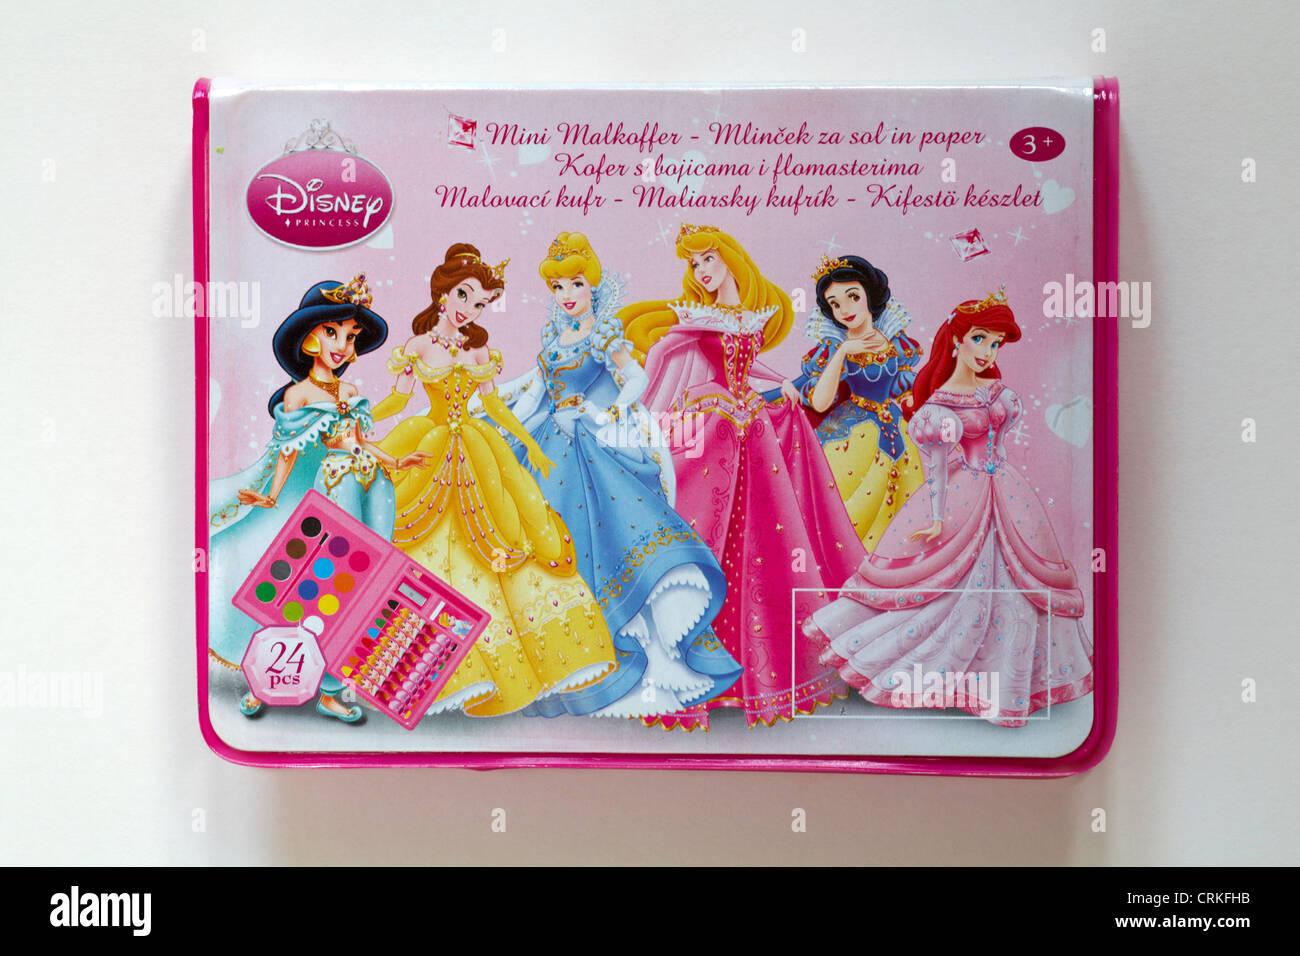 2de14b327 Disney Princess colouring set isolated on white background - Stock Image